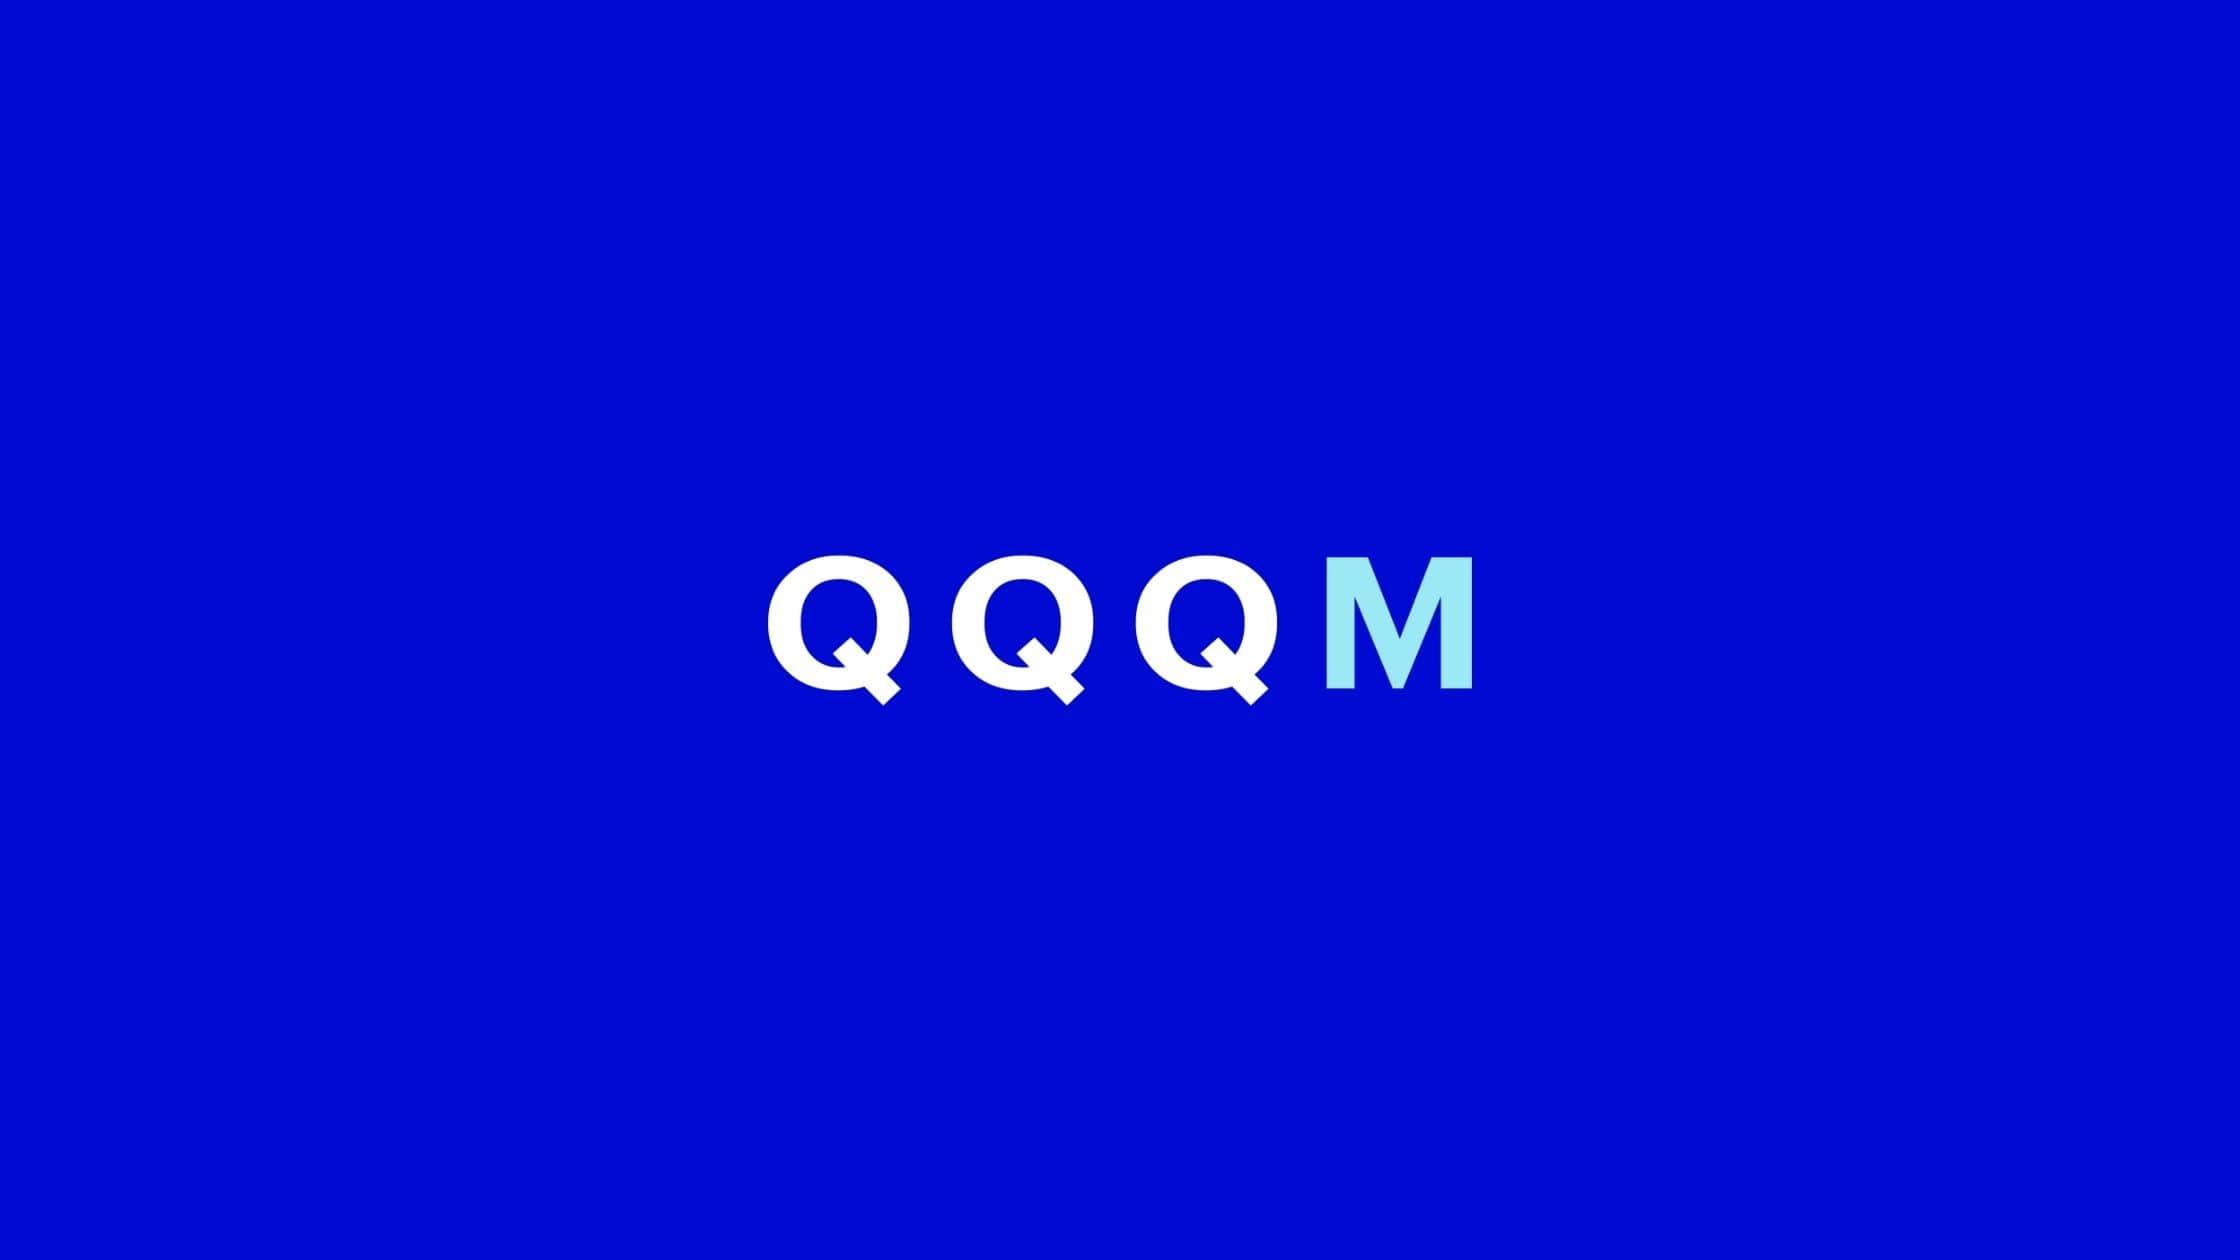 【QQQよりお得?】廉価版ETF、QQQMってどんなETF?